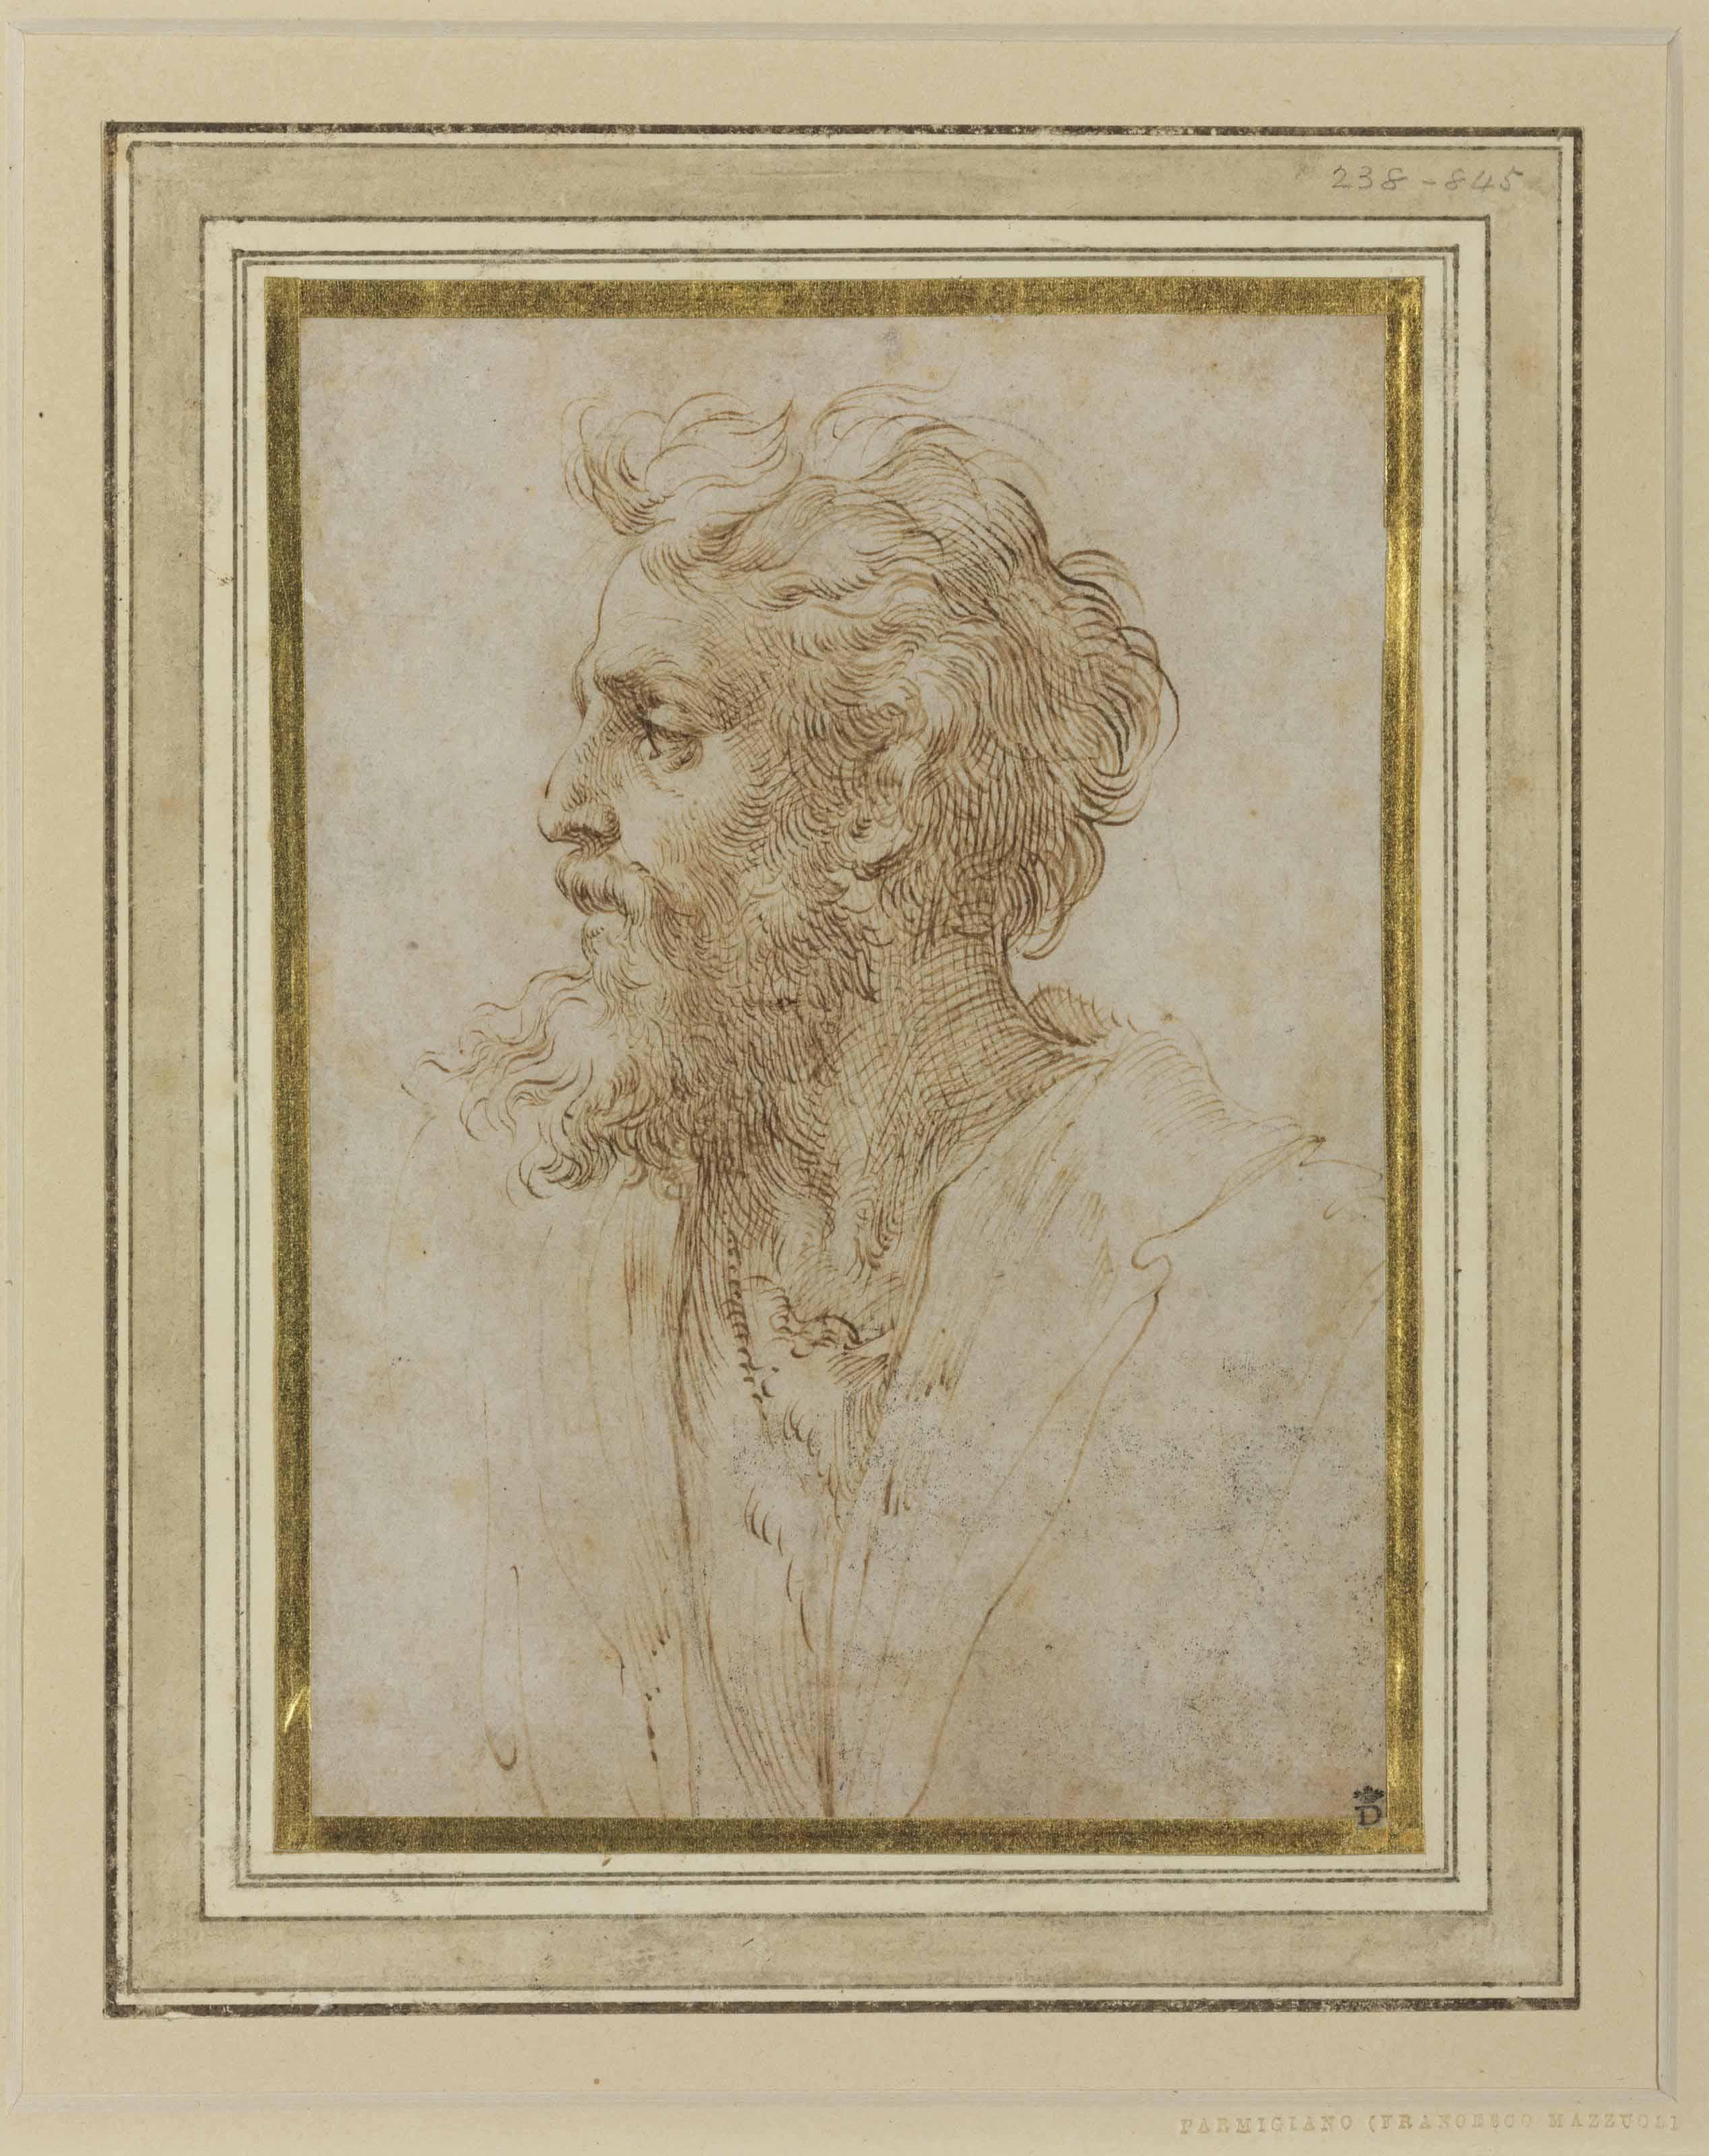 Girolamo Francesco Mazzola, Il